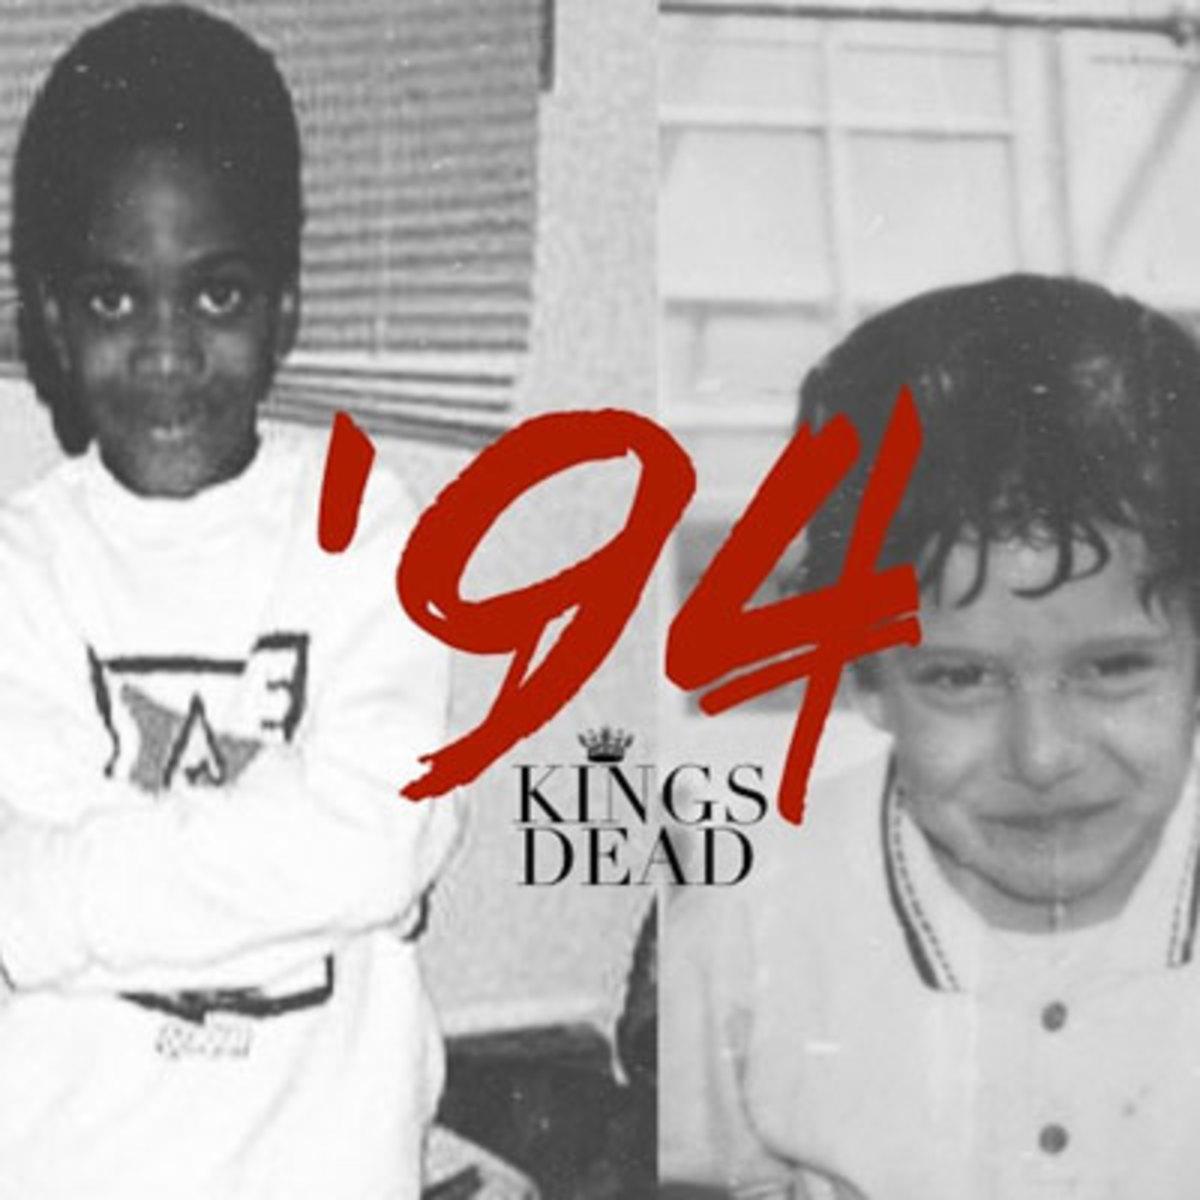 kingsdead-94.jpg